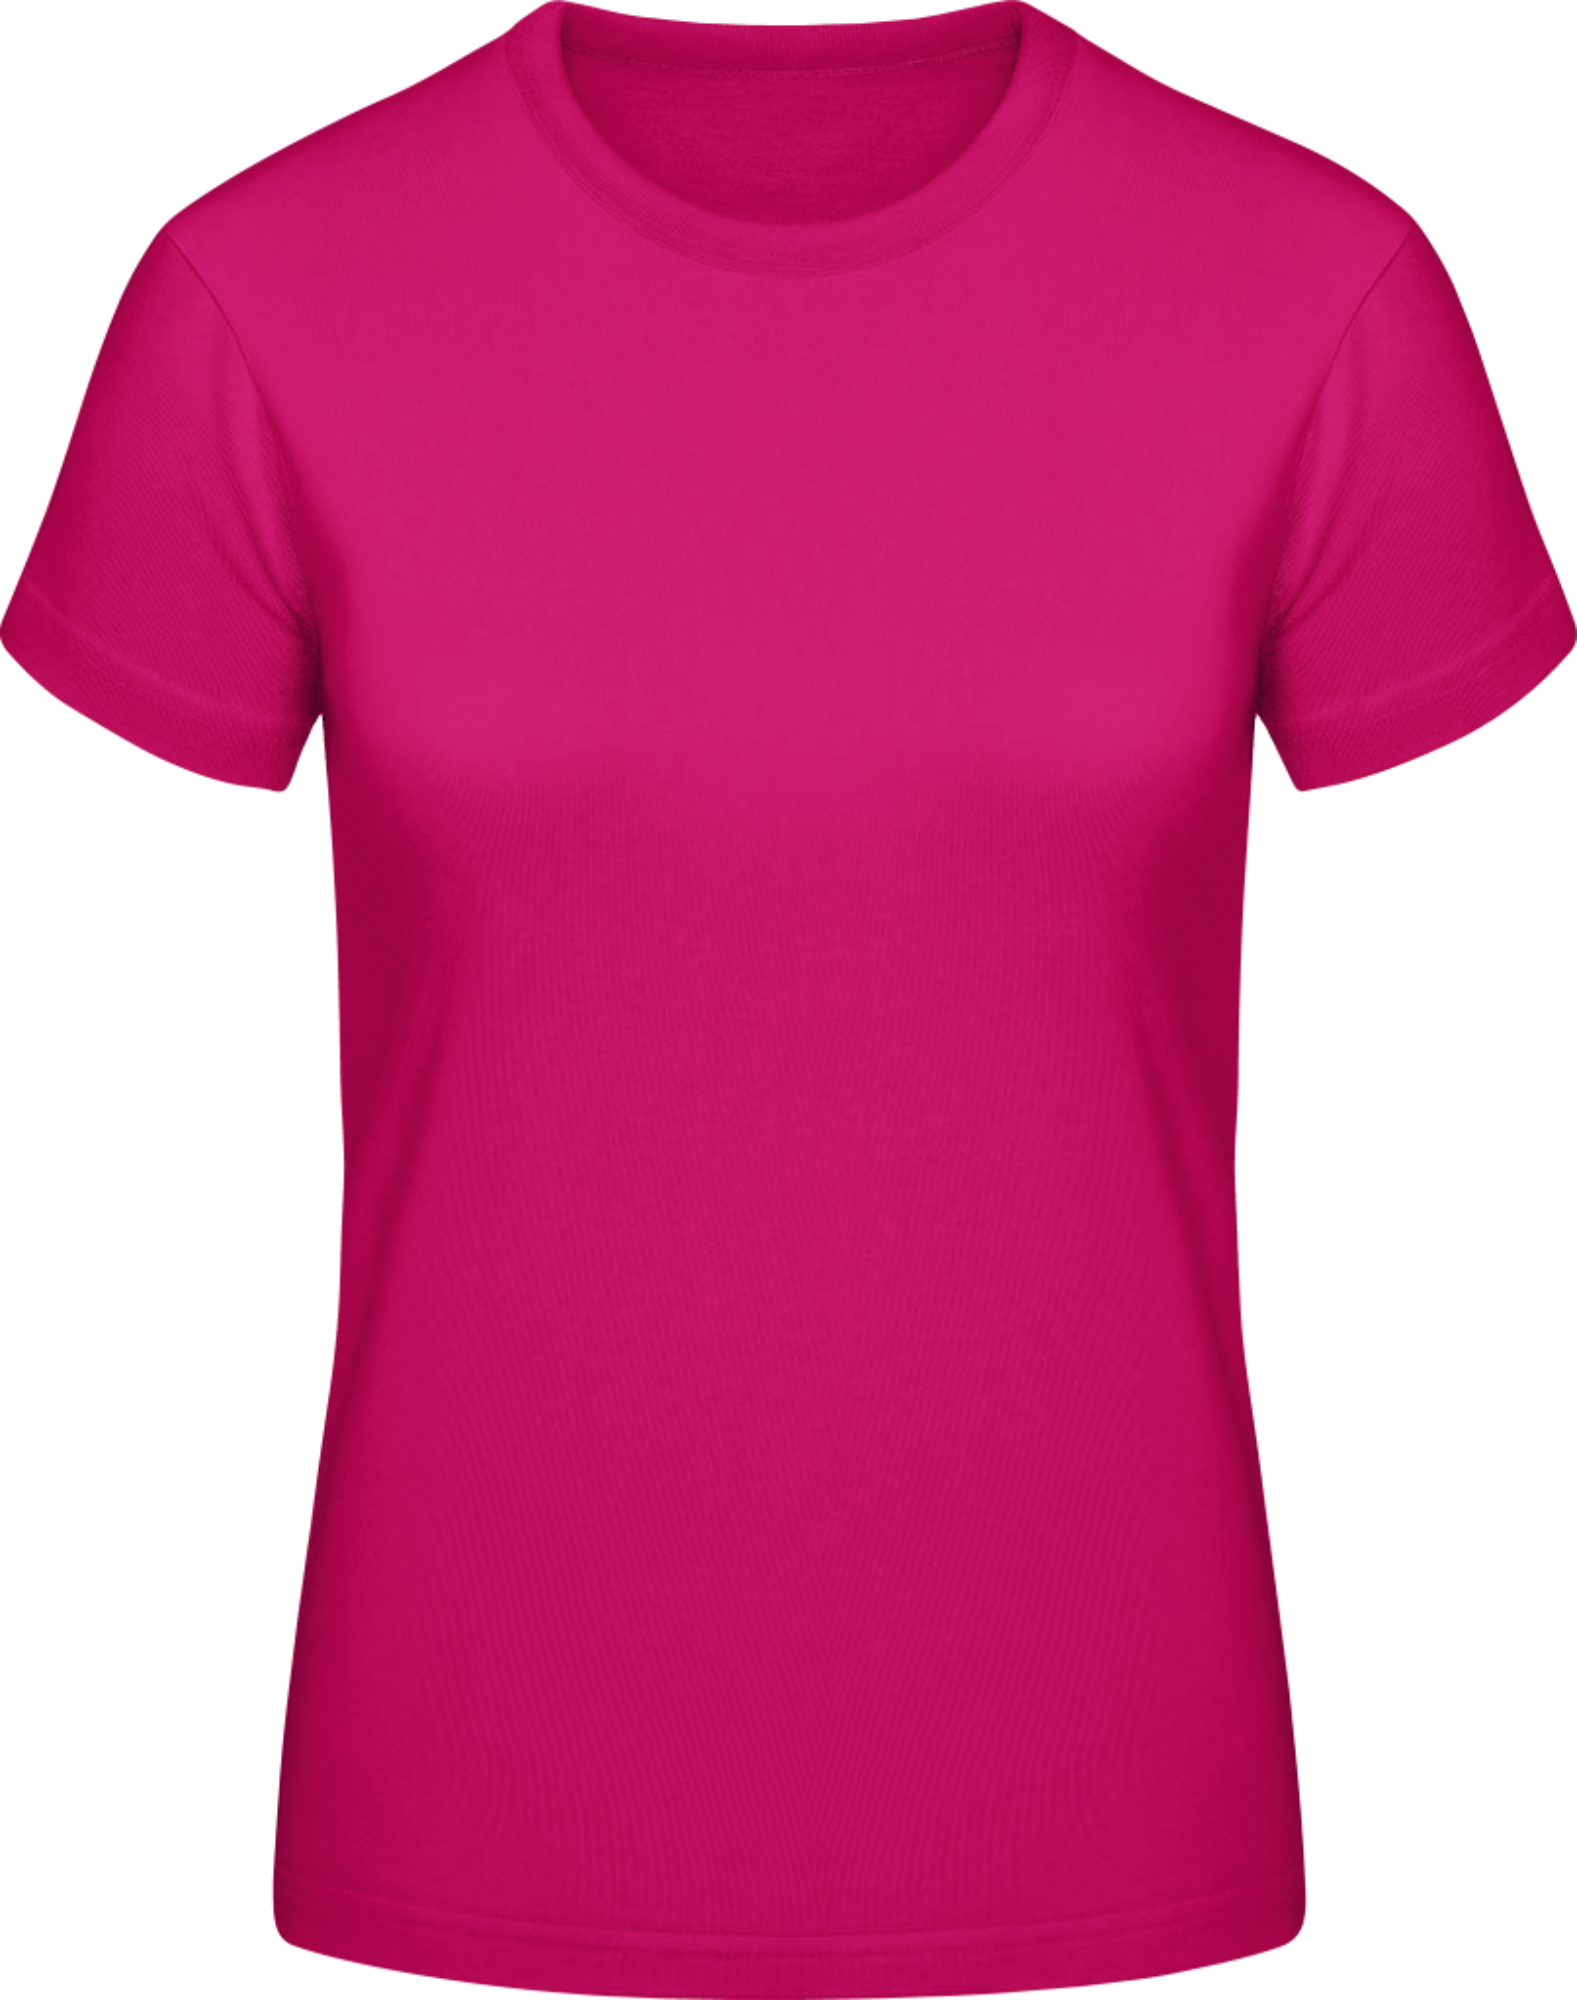 #E190 Women T-Shirt